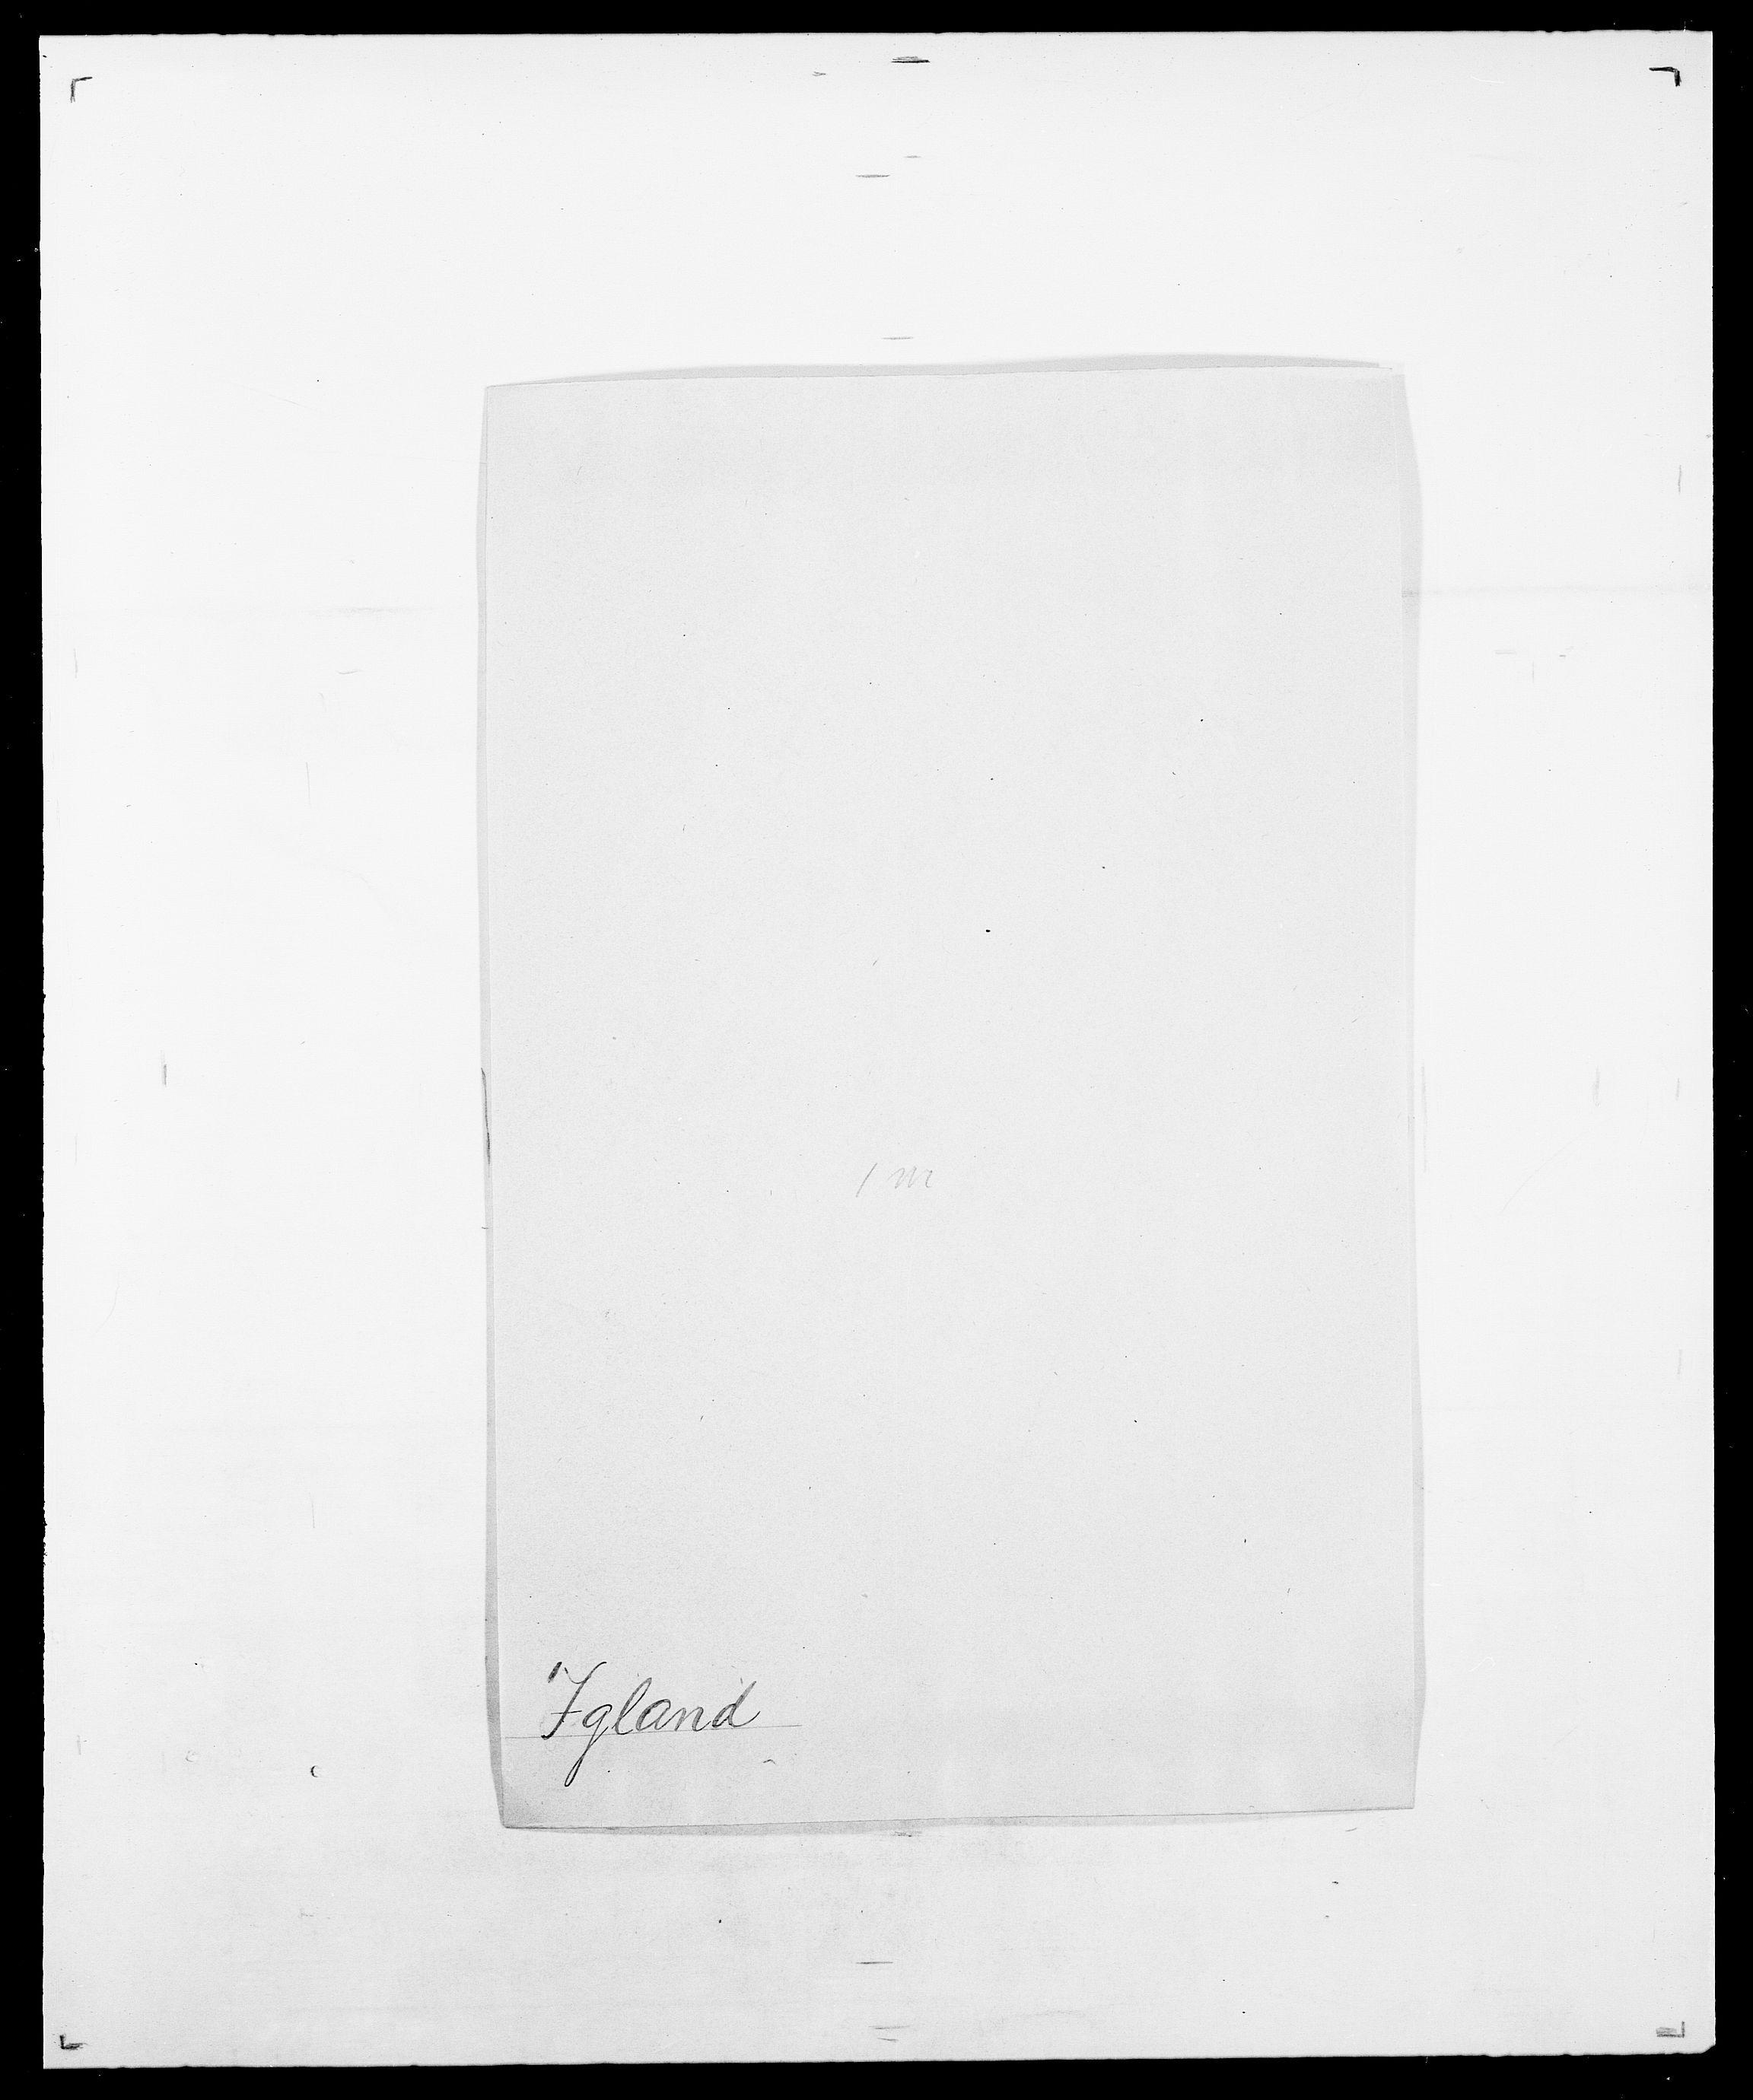 SAO, Delgobe, Charles Antoine - samling, D/Da/L0019: van der Hude - Joys, s. 757